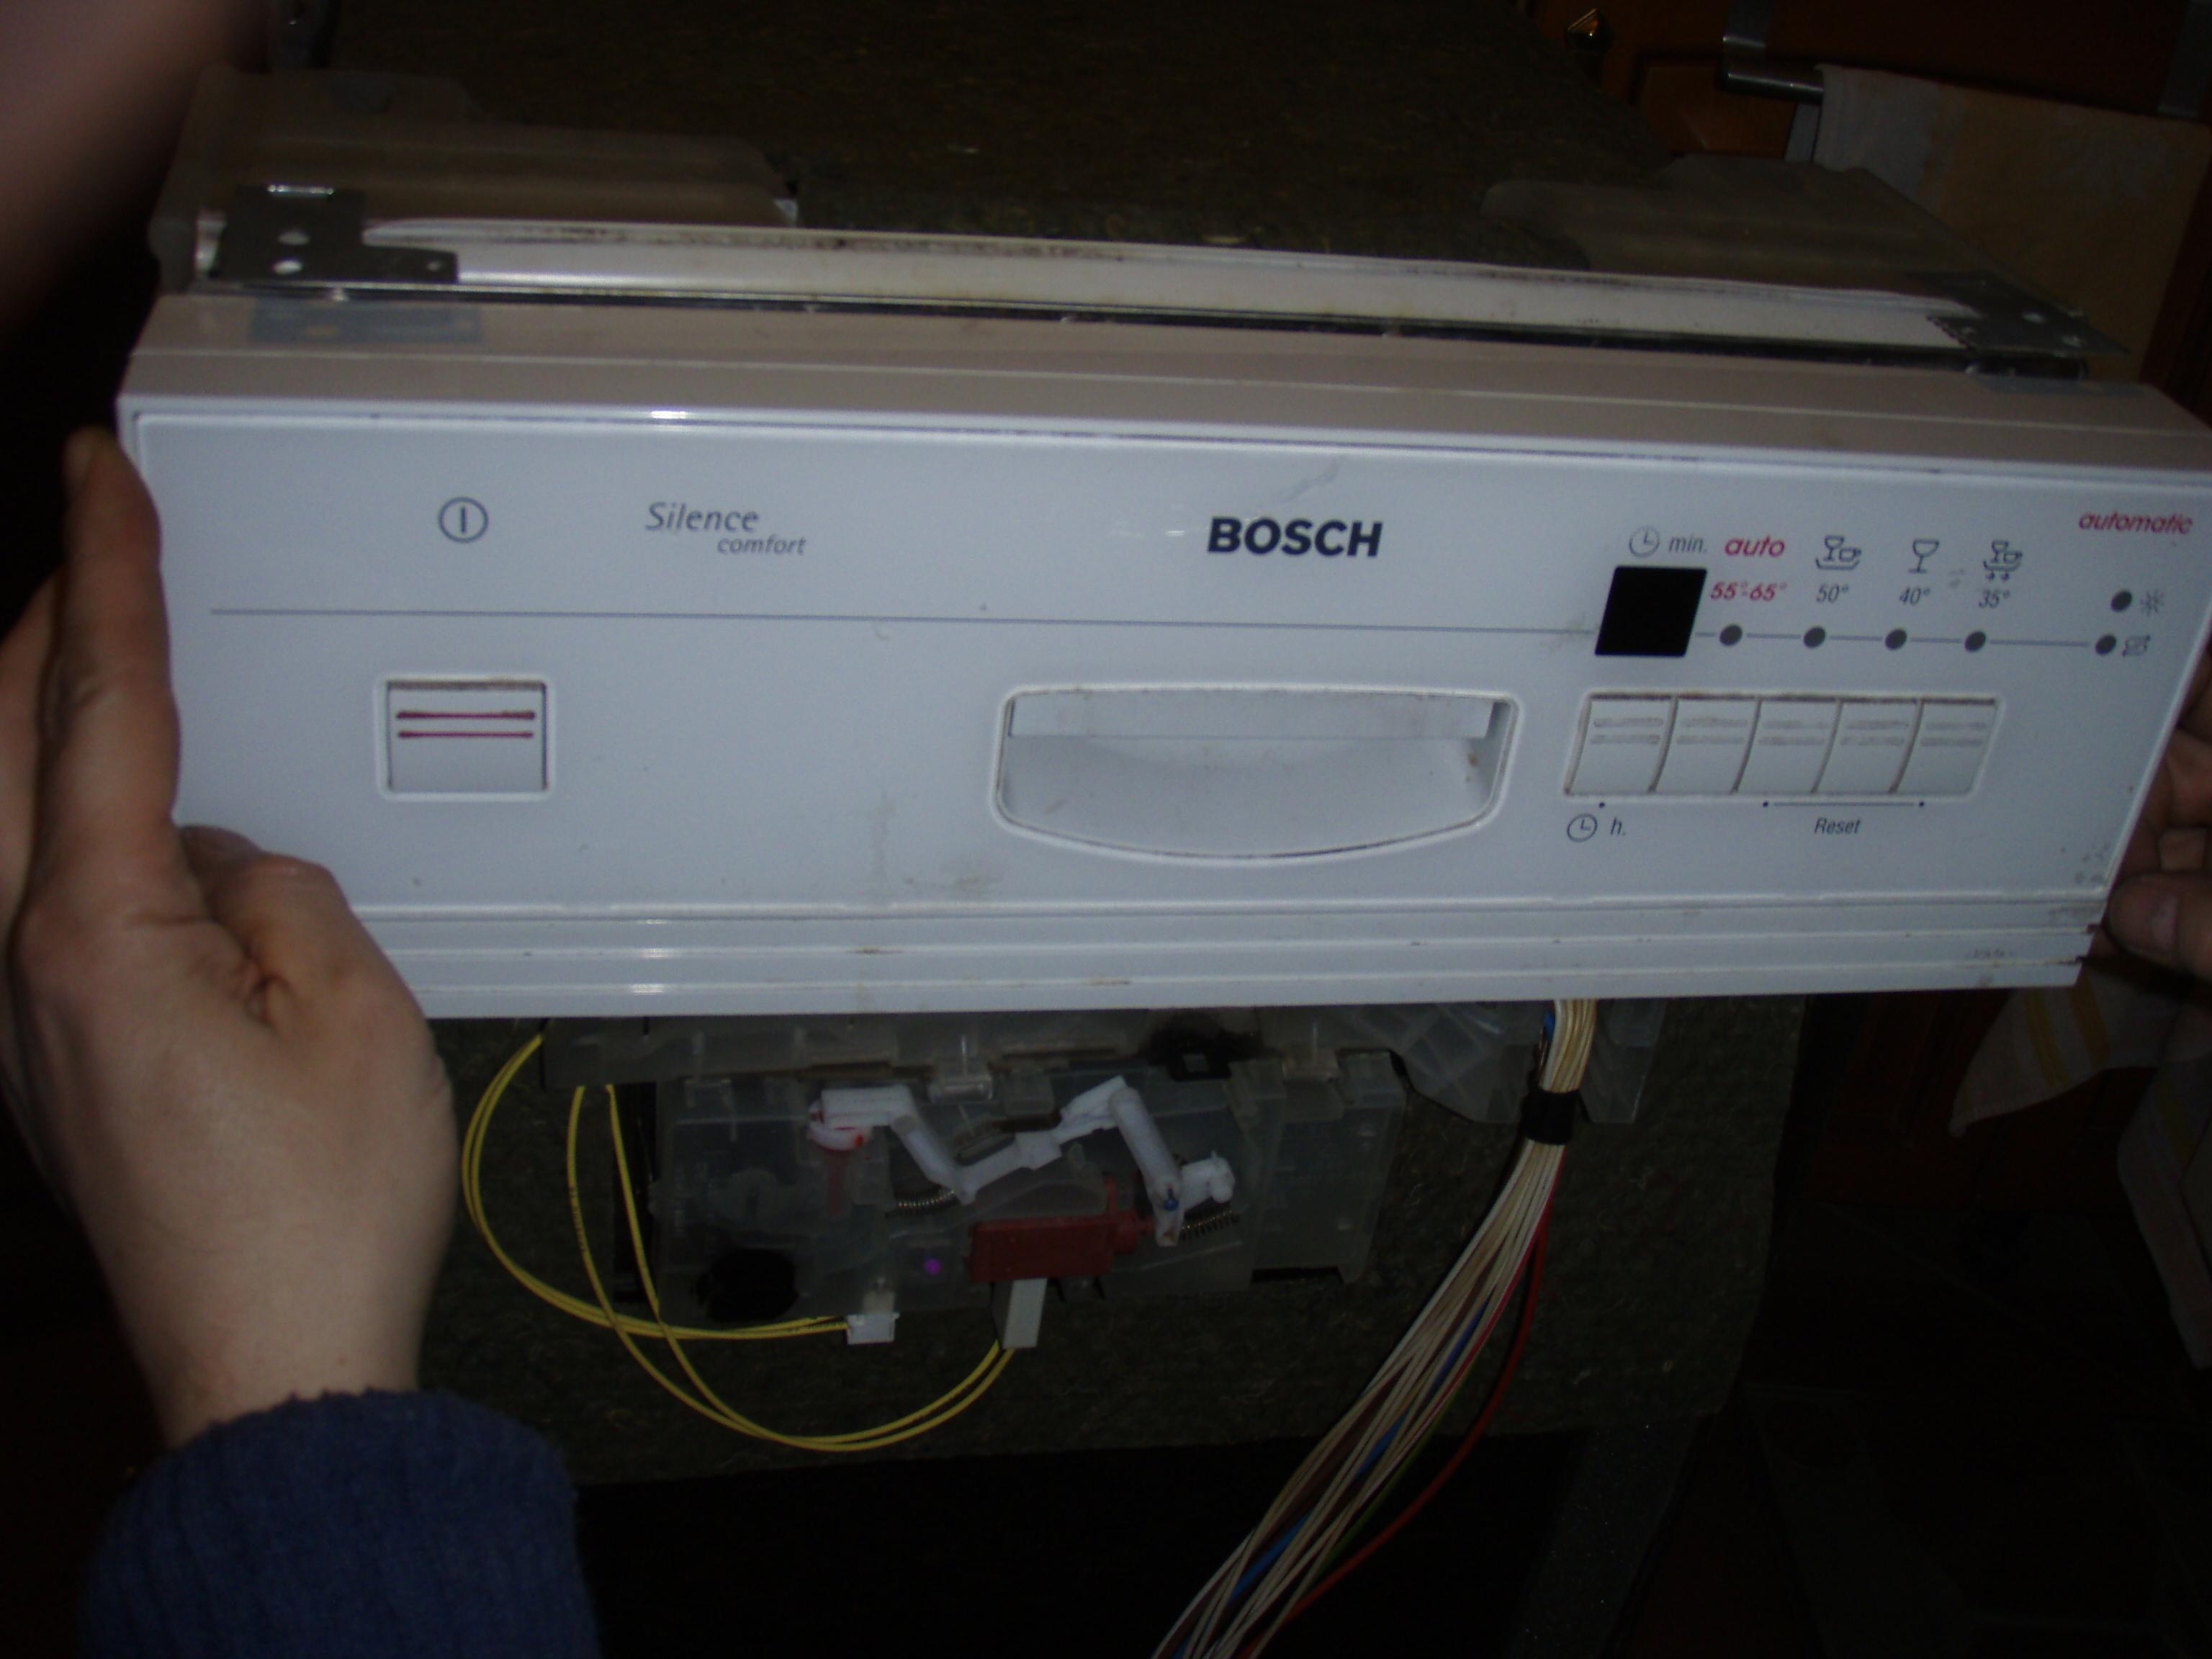 zmywarka BOSH e-nr: SRI46A02/15 nie dzia�a - potrzebny manual